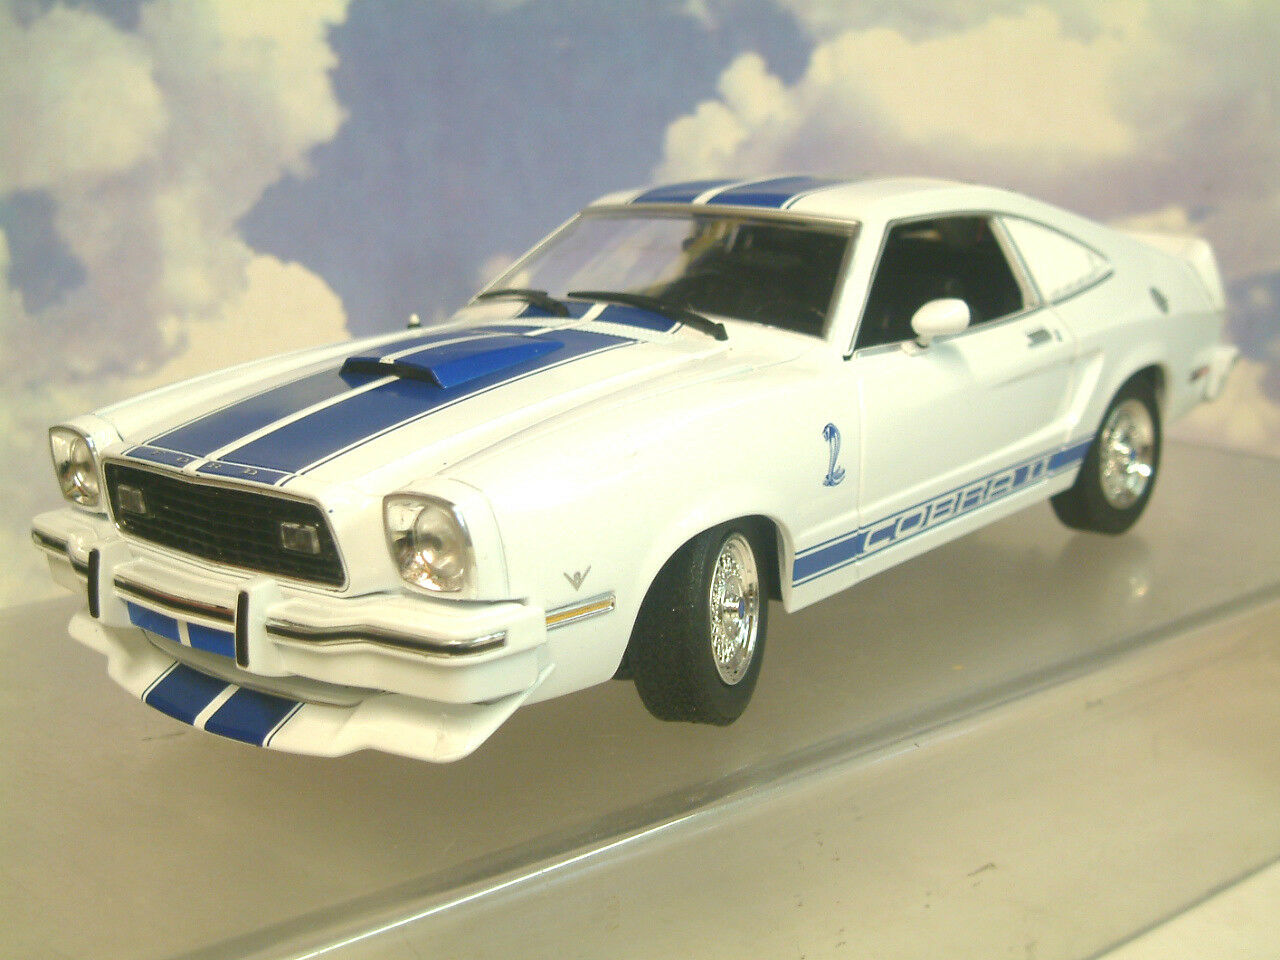 1 18 GrünLIGHT Jill Munroe's 1976 Ford Mustang II 2 COBRA II Charlie's Engel